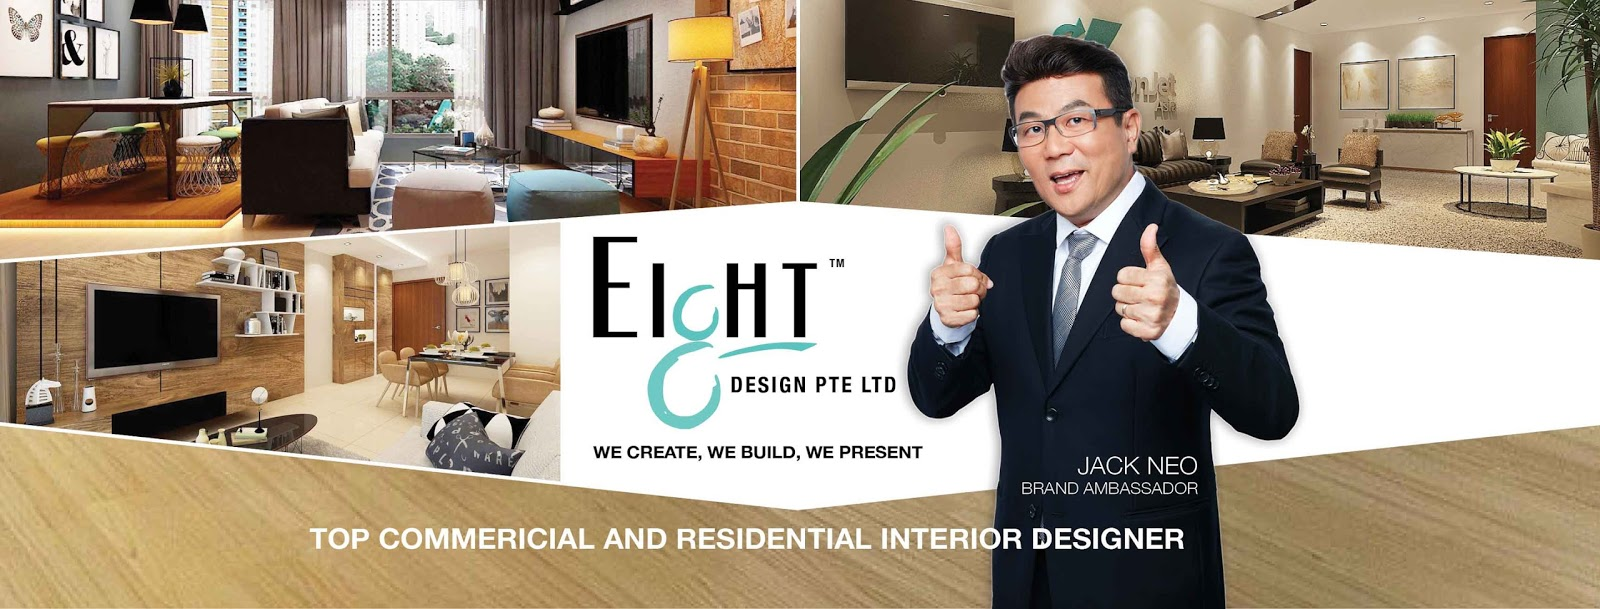 Eight Design Residential Office Interior Design Company Singapore Choose The Perfect Interior Designers Singapore